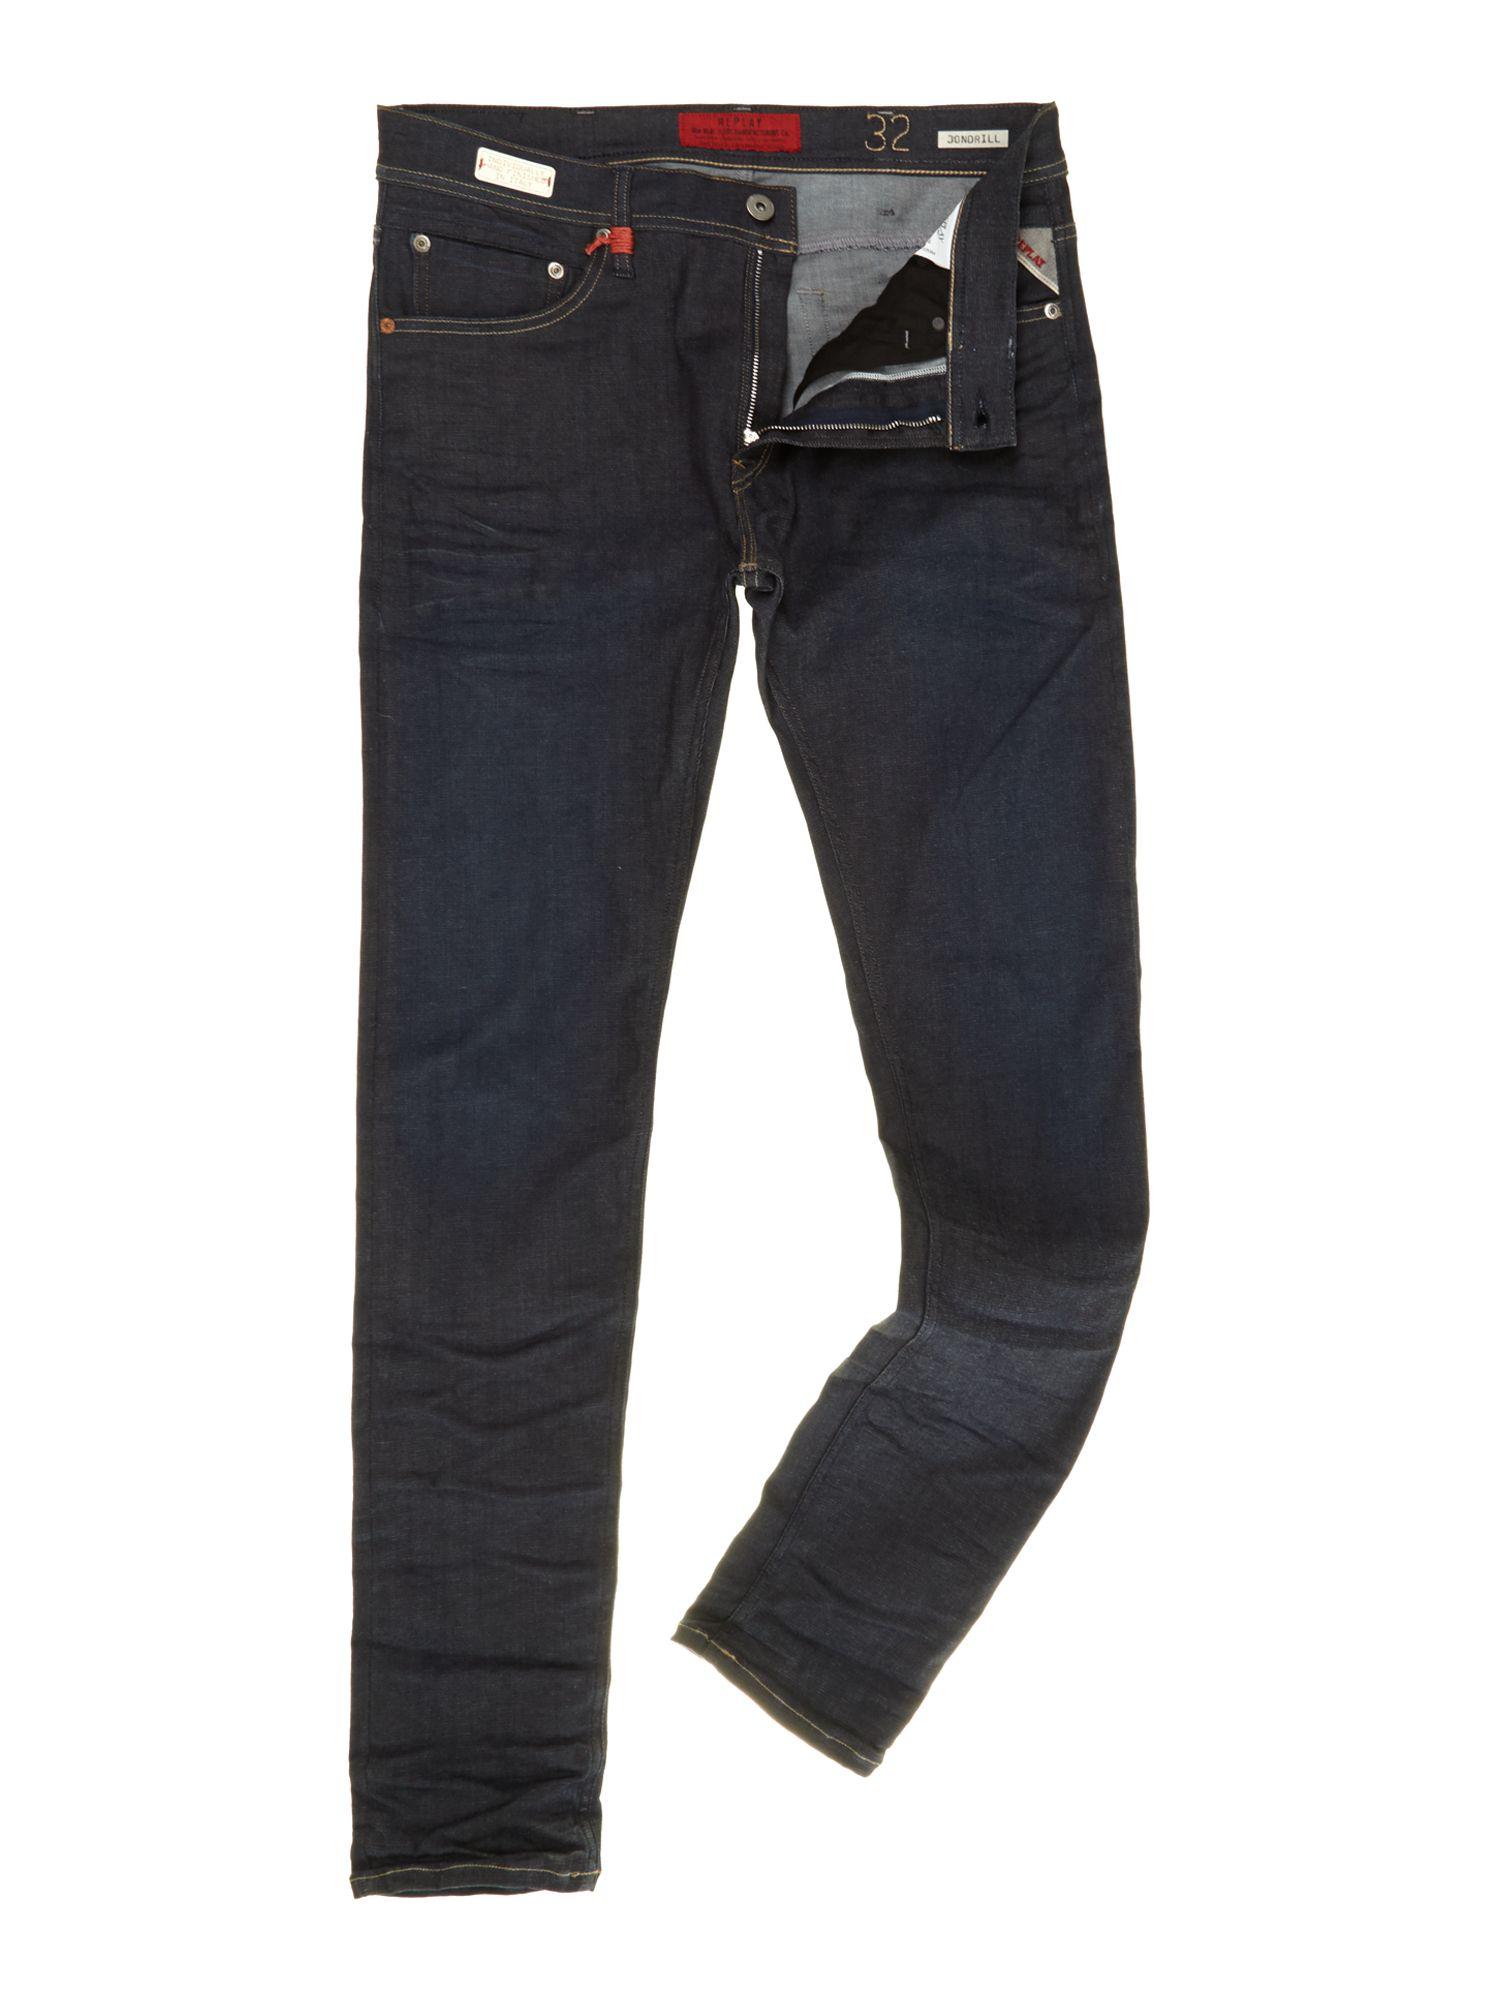 replay jondrill hyperflex skinny fit jeans in blue for men. Black Bedroom Furniture Sets. Home Design Ideas